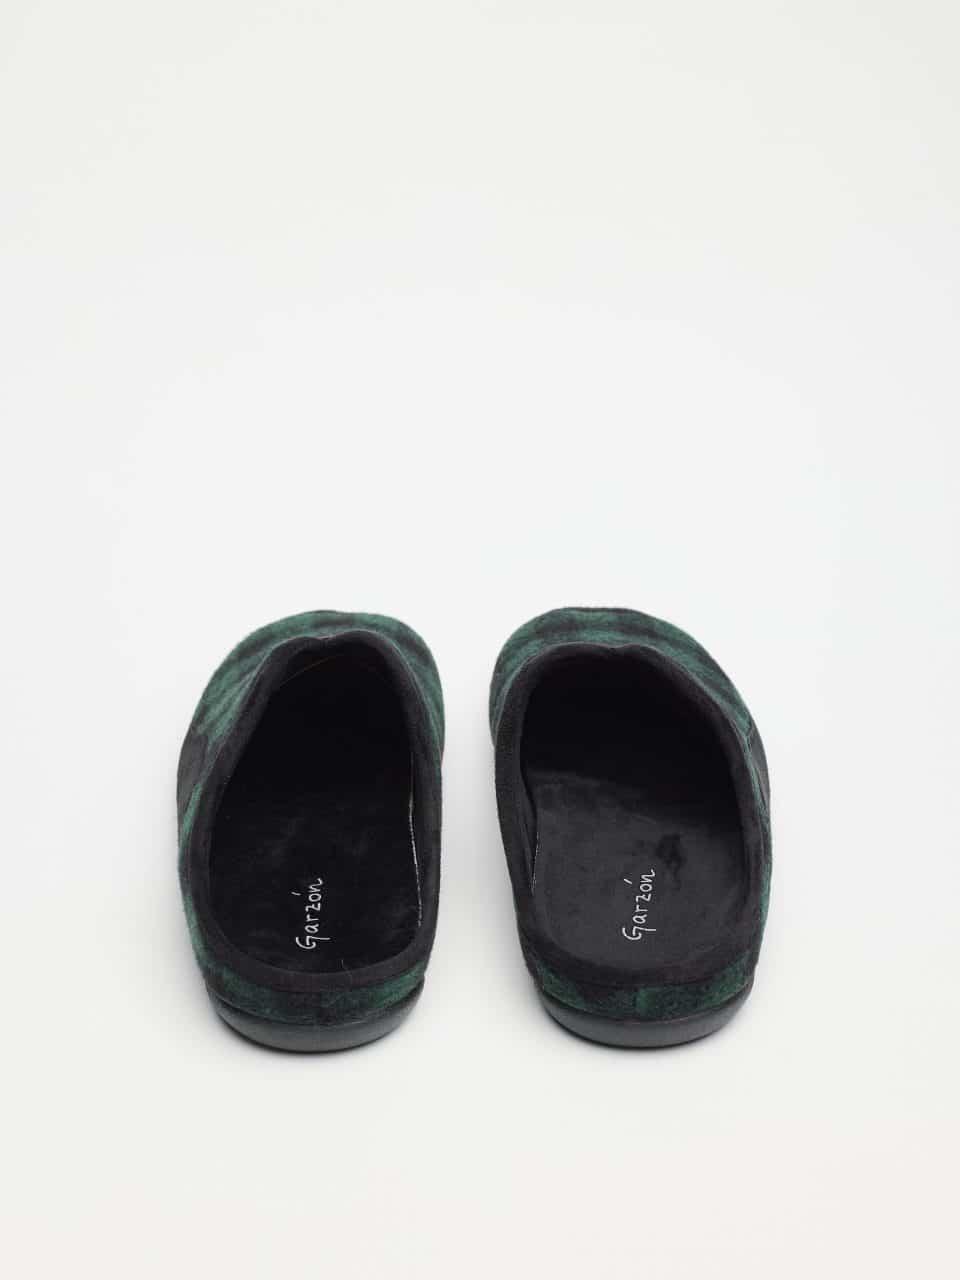 ZUECO LUSSEMBURGO KAKI Garzón en Loyna Shoes